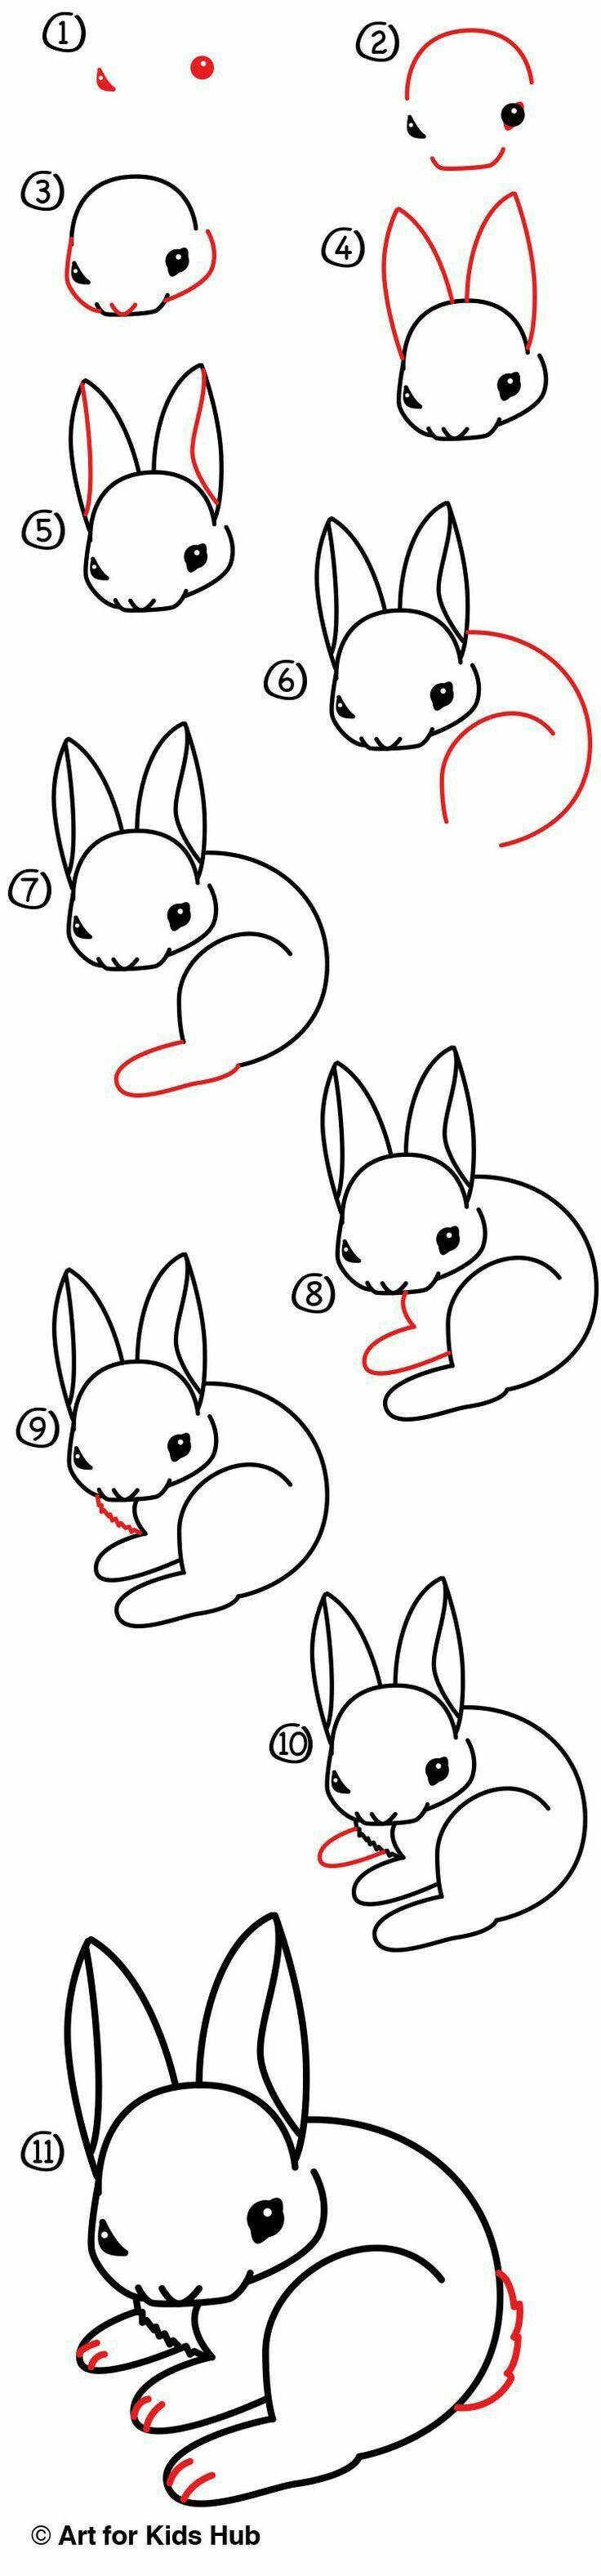 Draw a Rabbit. . .